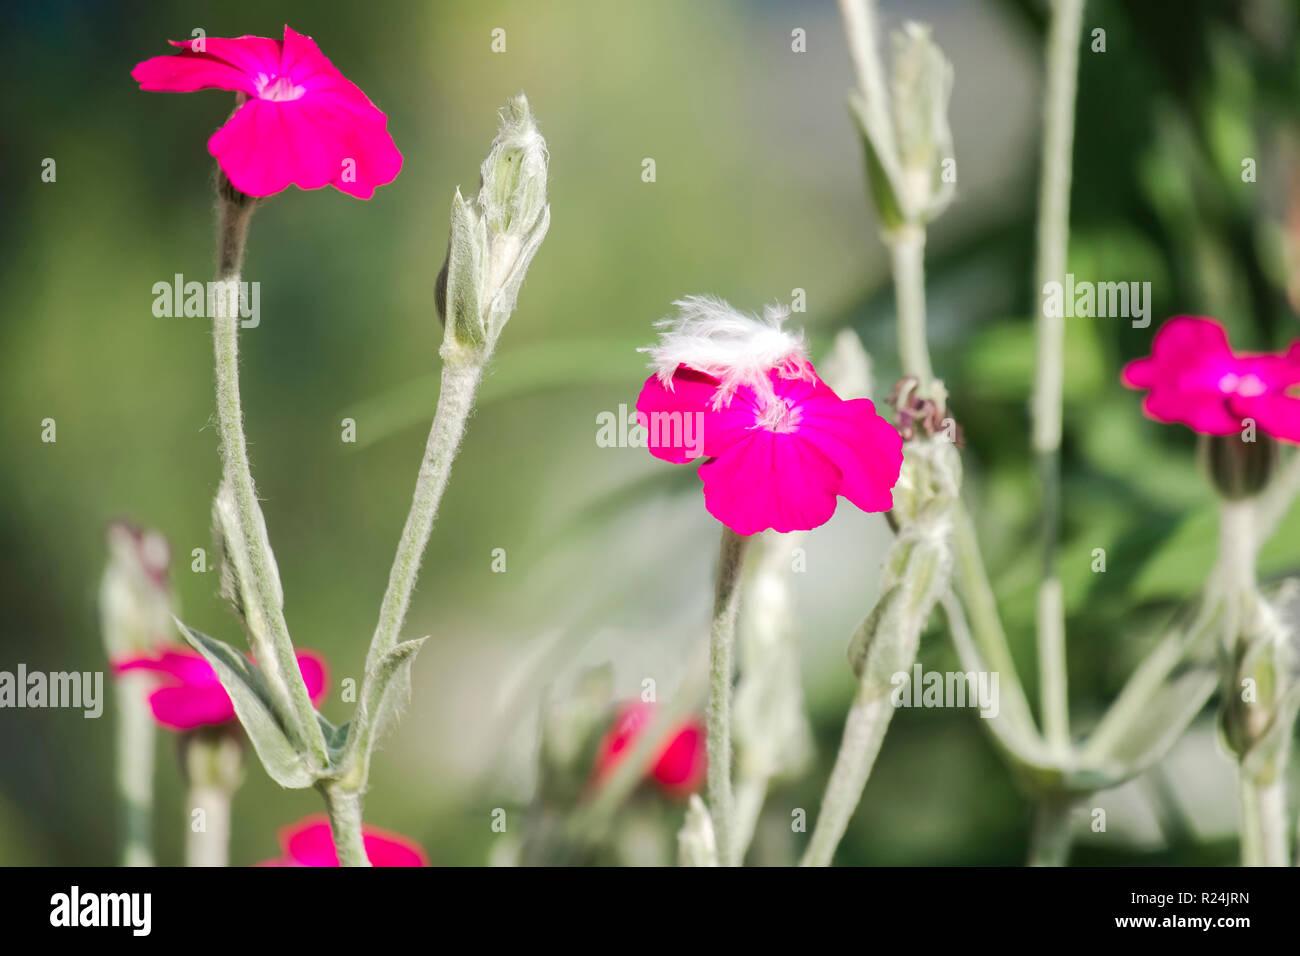 Flowers of rose campion (Silene coronaria) - Stock Image